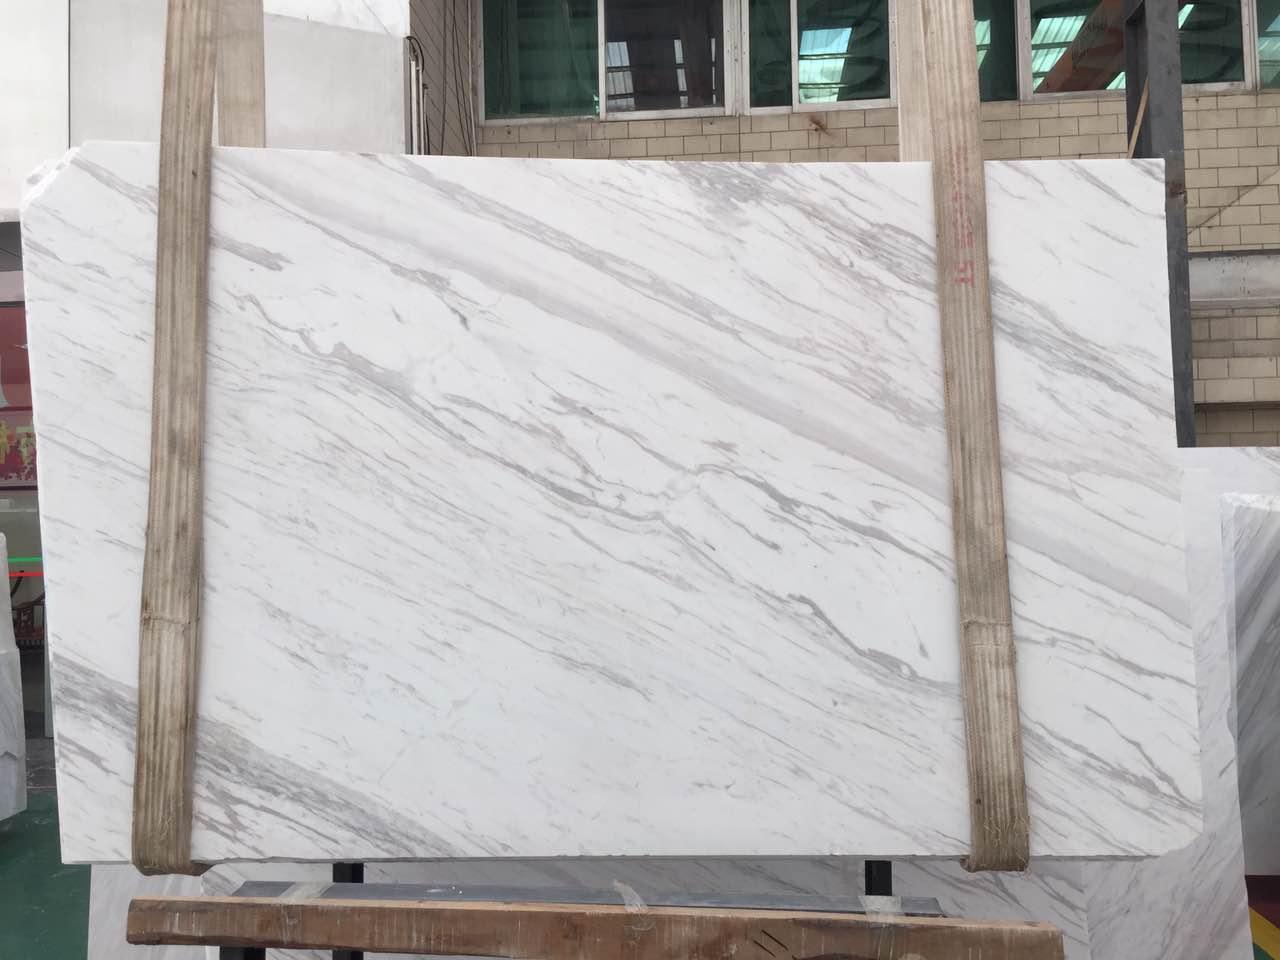 Volakas whtie Marble slabs